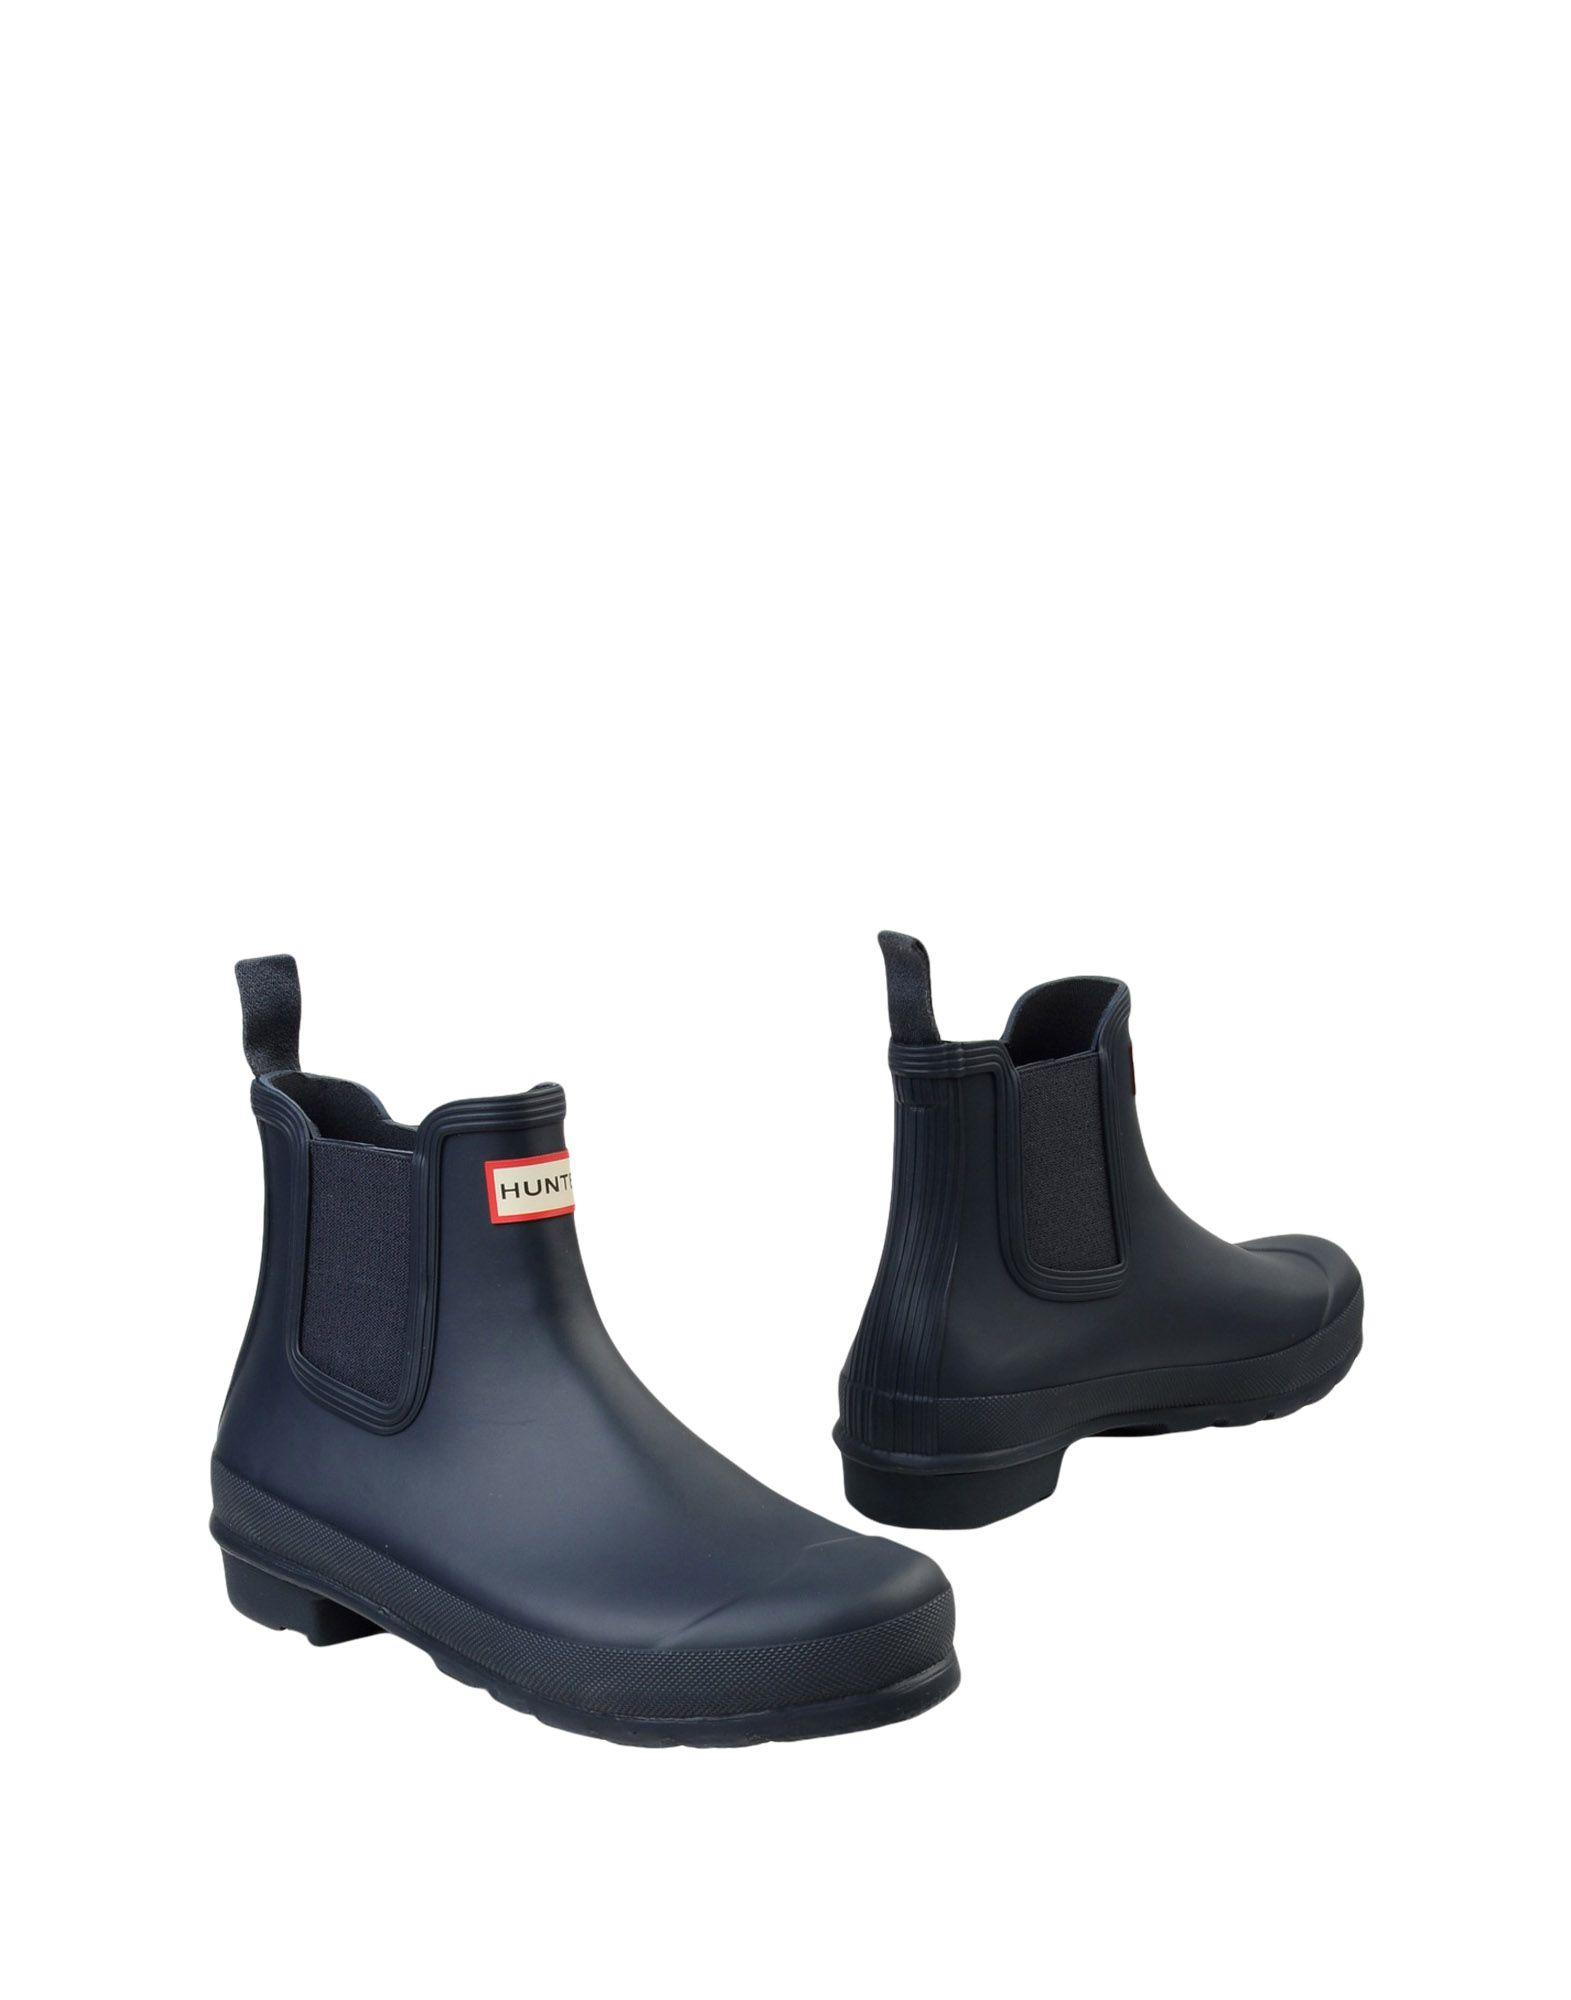 HUNTER Полусапоги и высокие ботинки magazzini del sale полусапоги и высокие ботинки